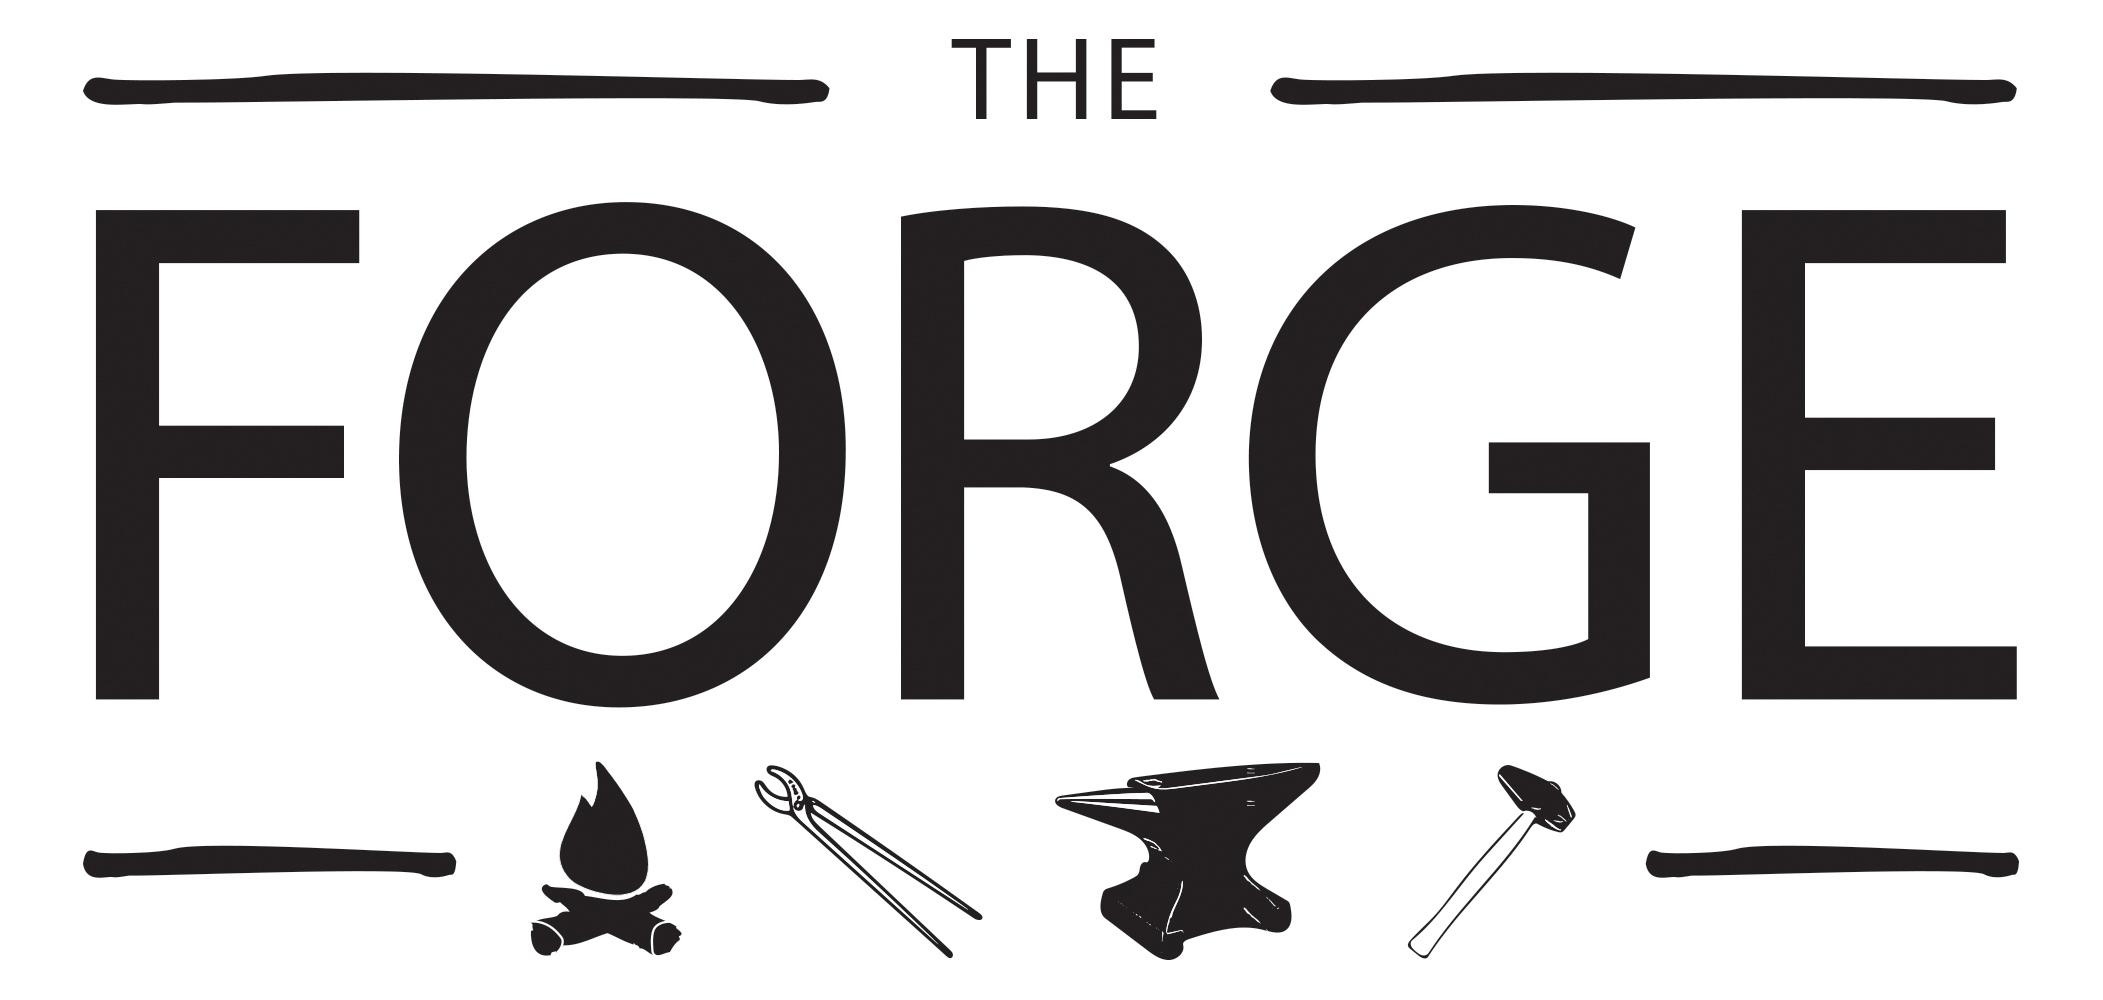 the_forge_logo.jpg